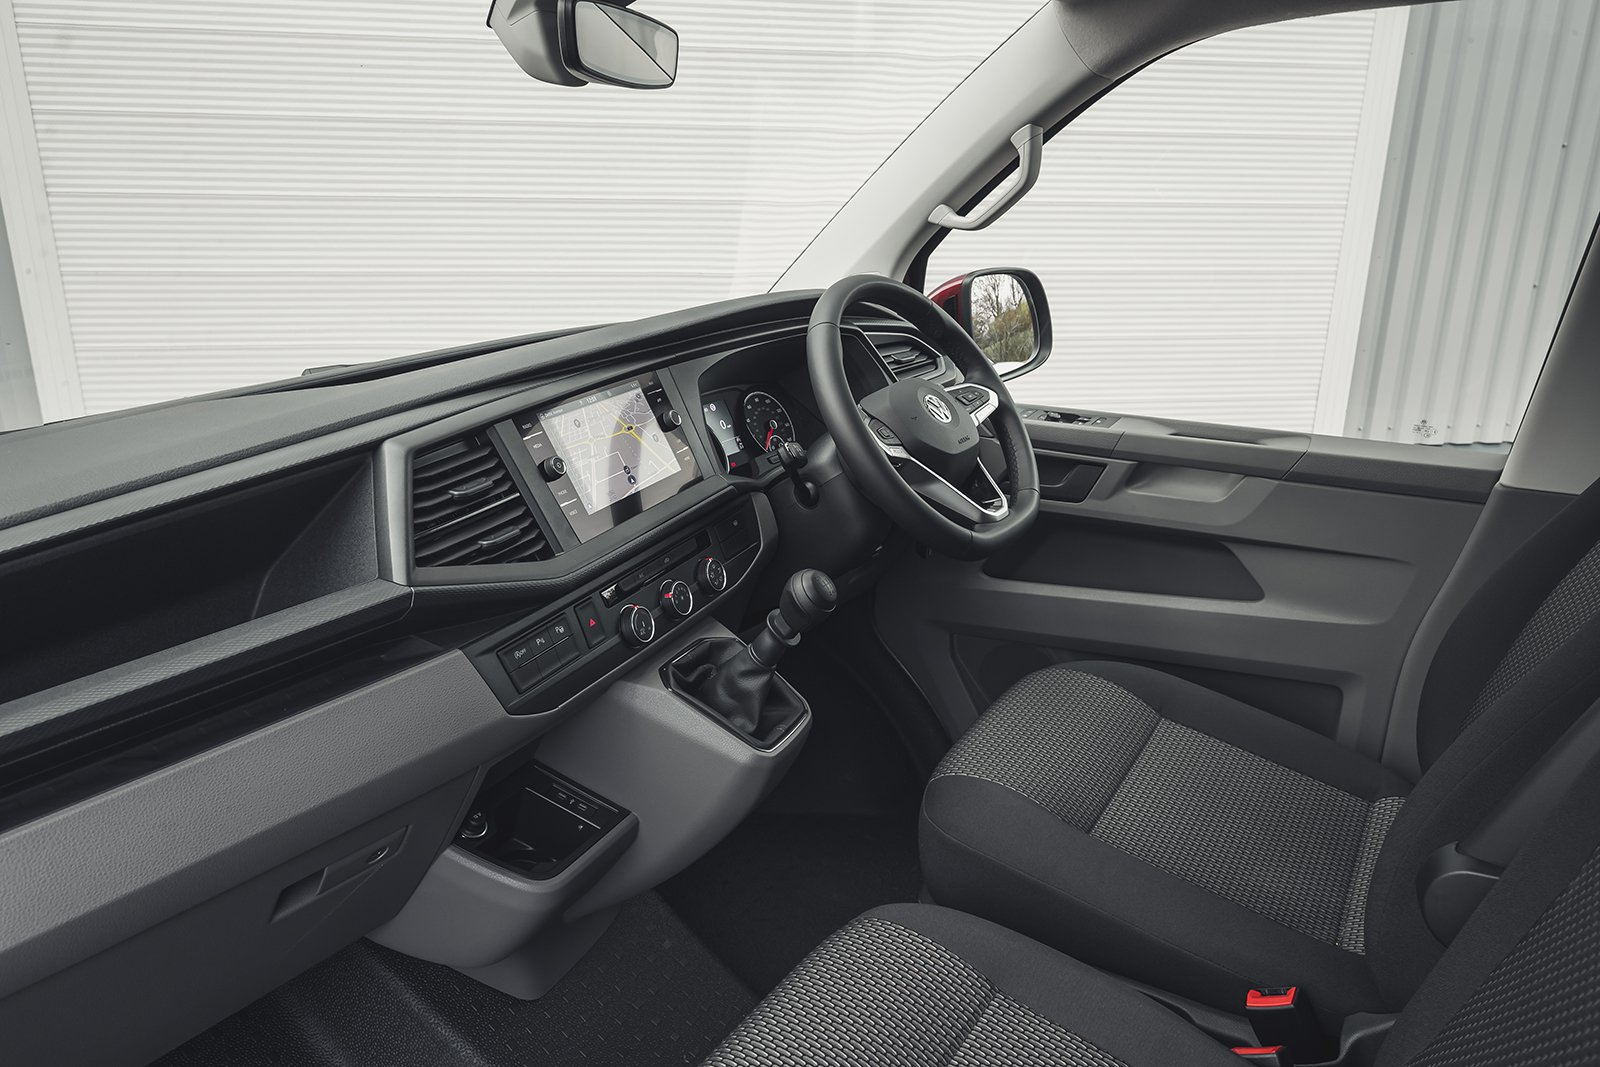 Volkswagen Transporter 6.1 interior